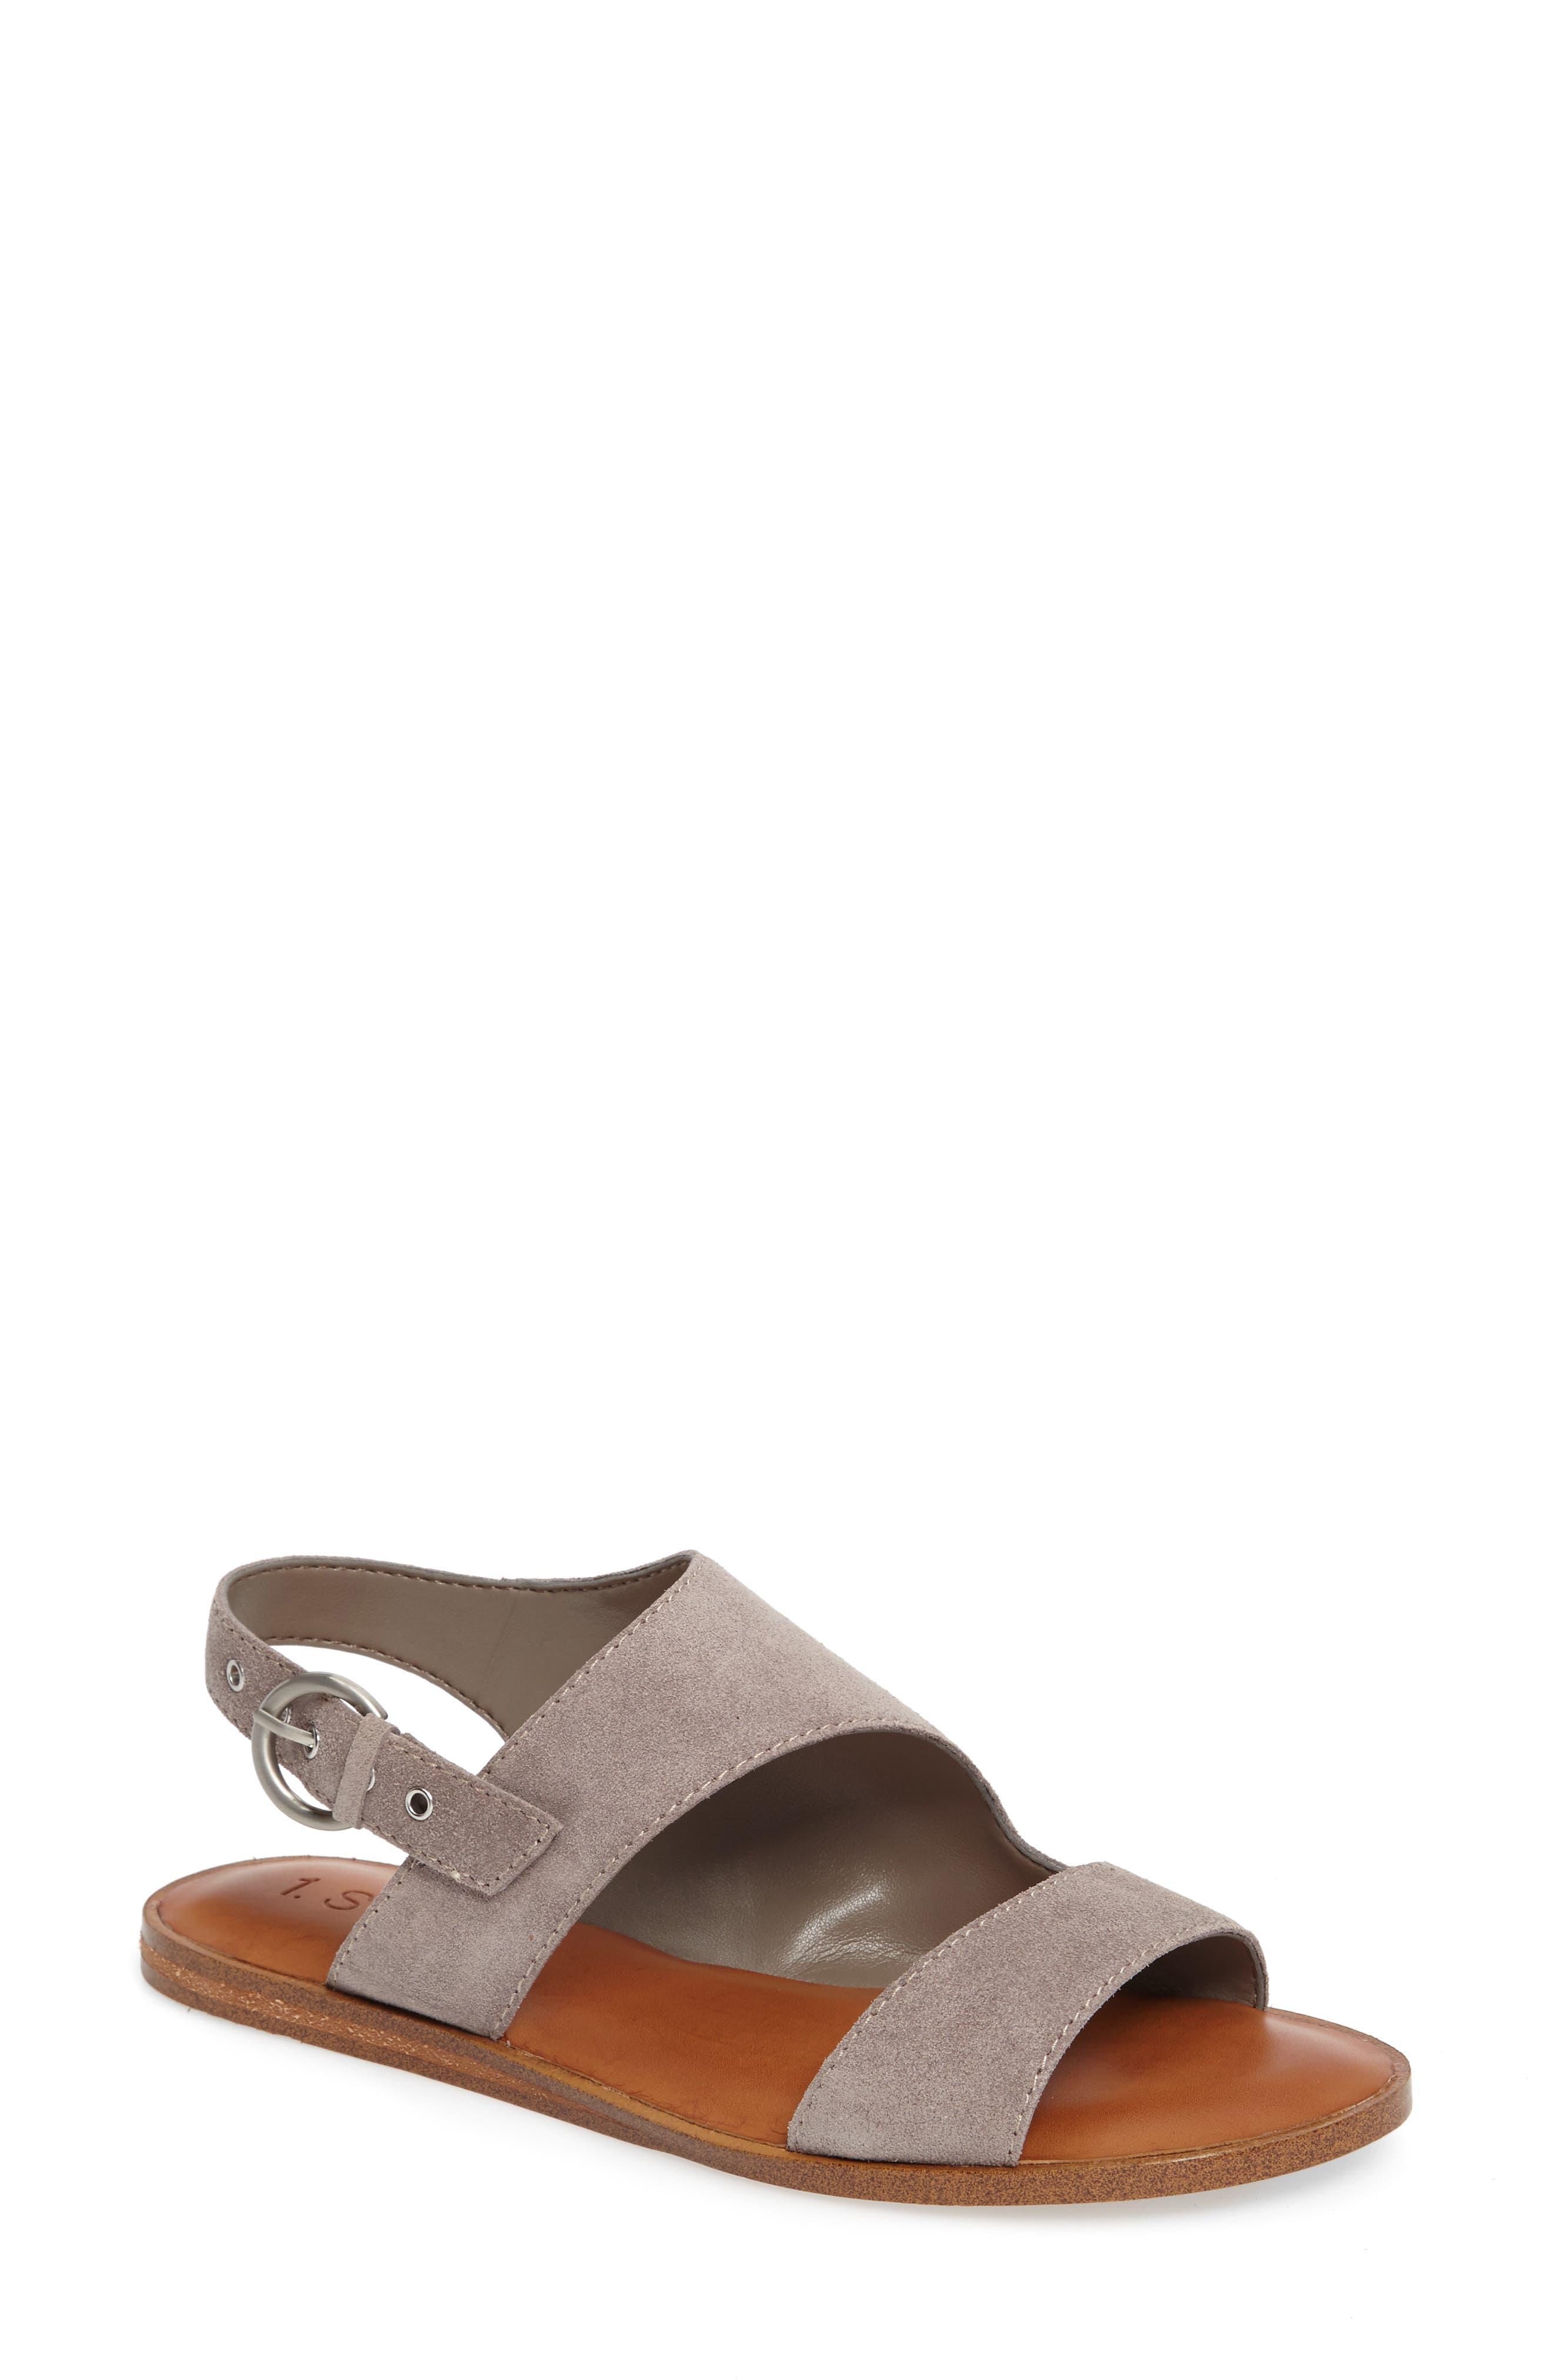 Main Image - 1.STATE Calen Sandal (Women)